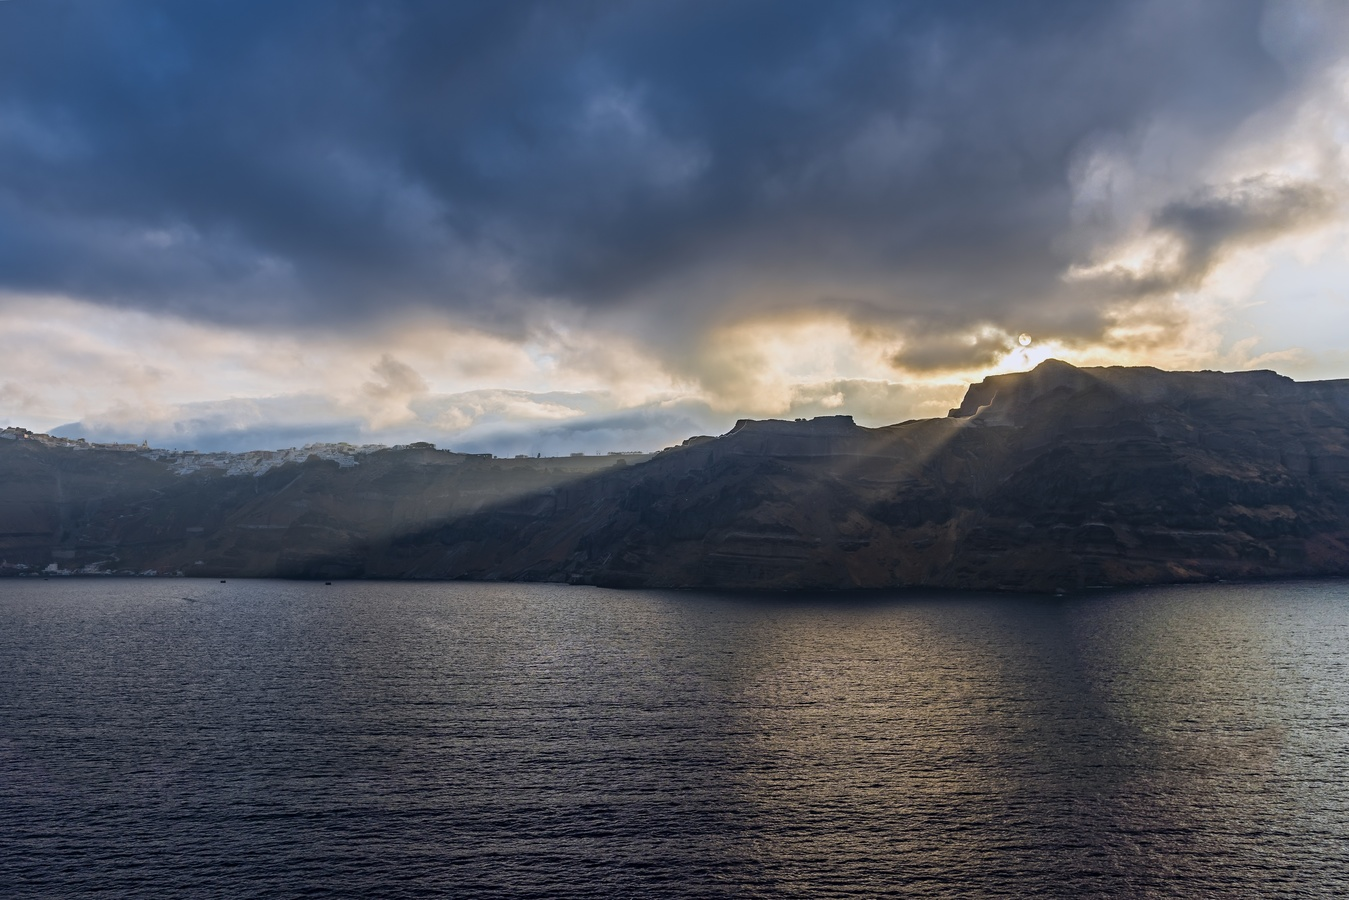 Ráno u Santorini